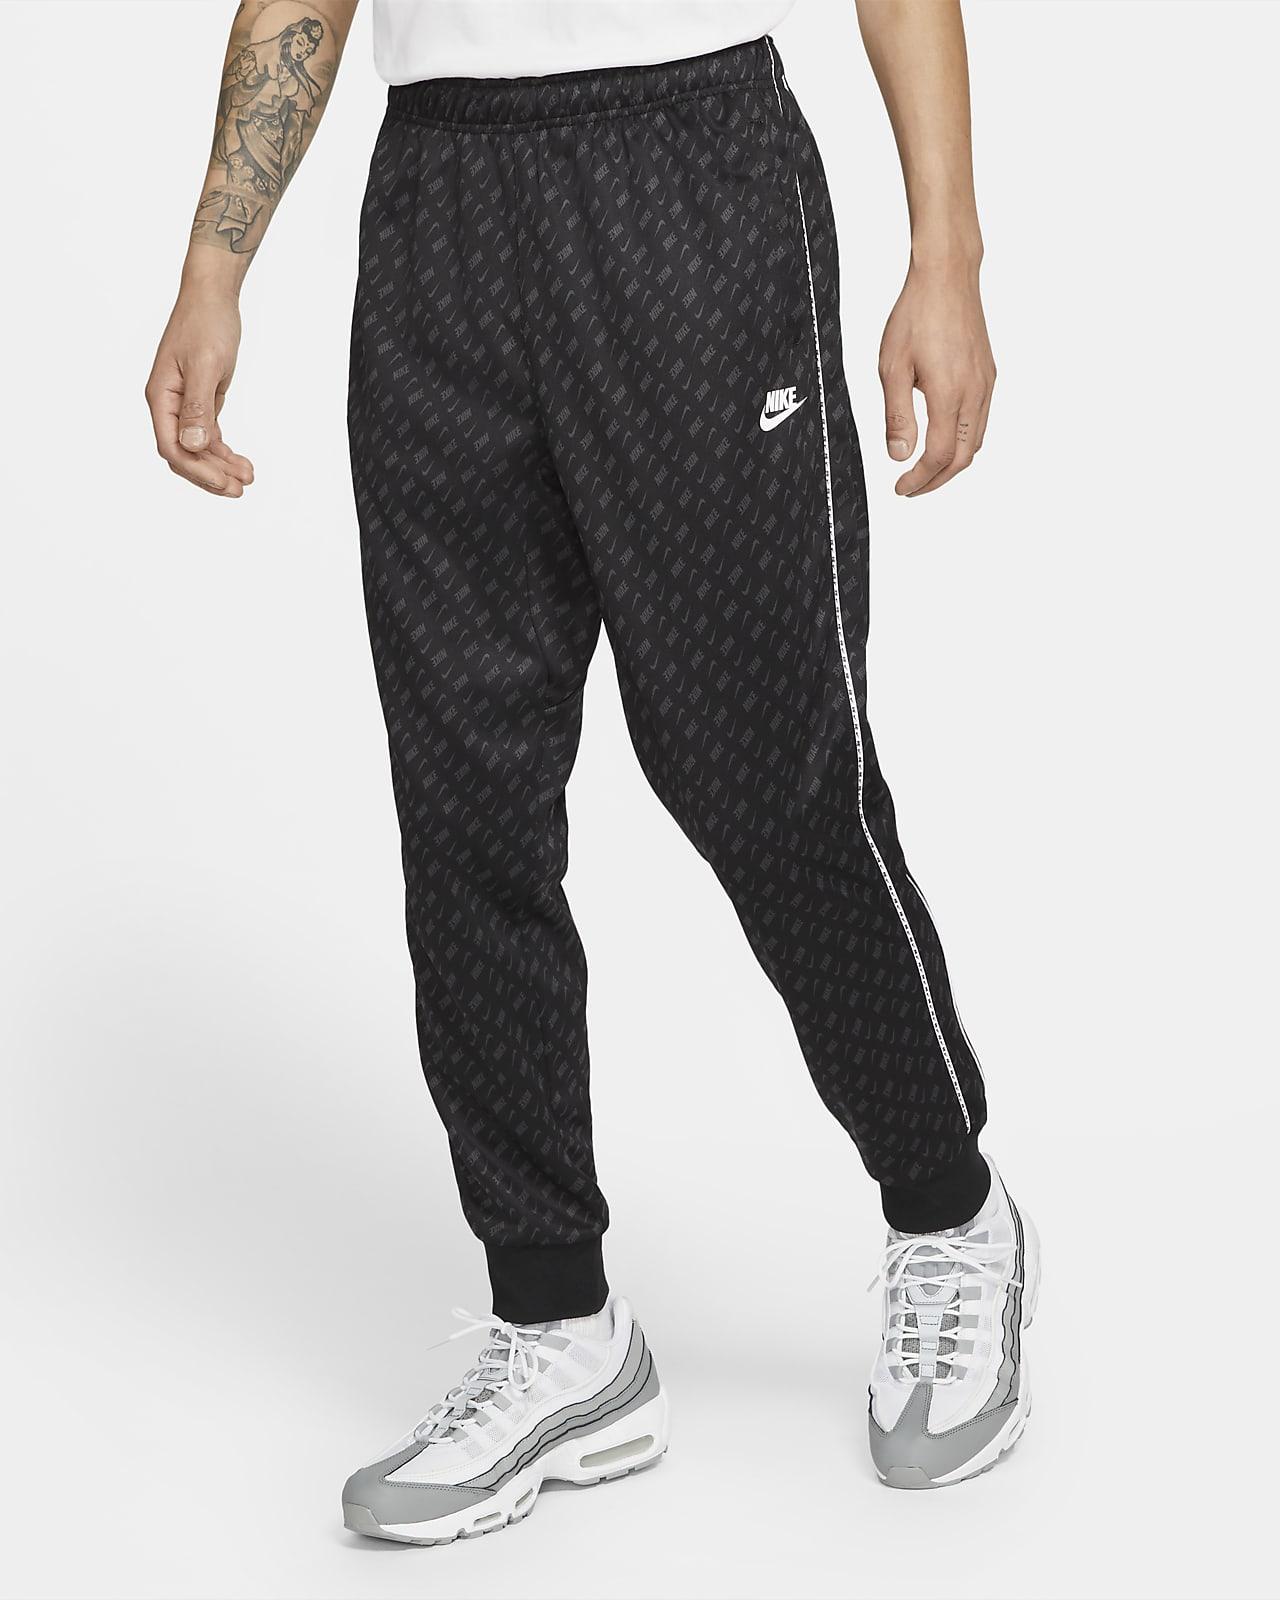 Nike Sportswear-joggers til mænd